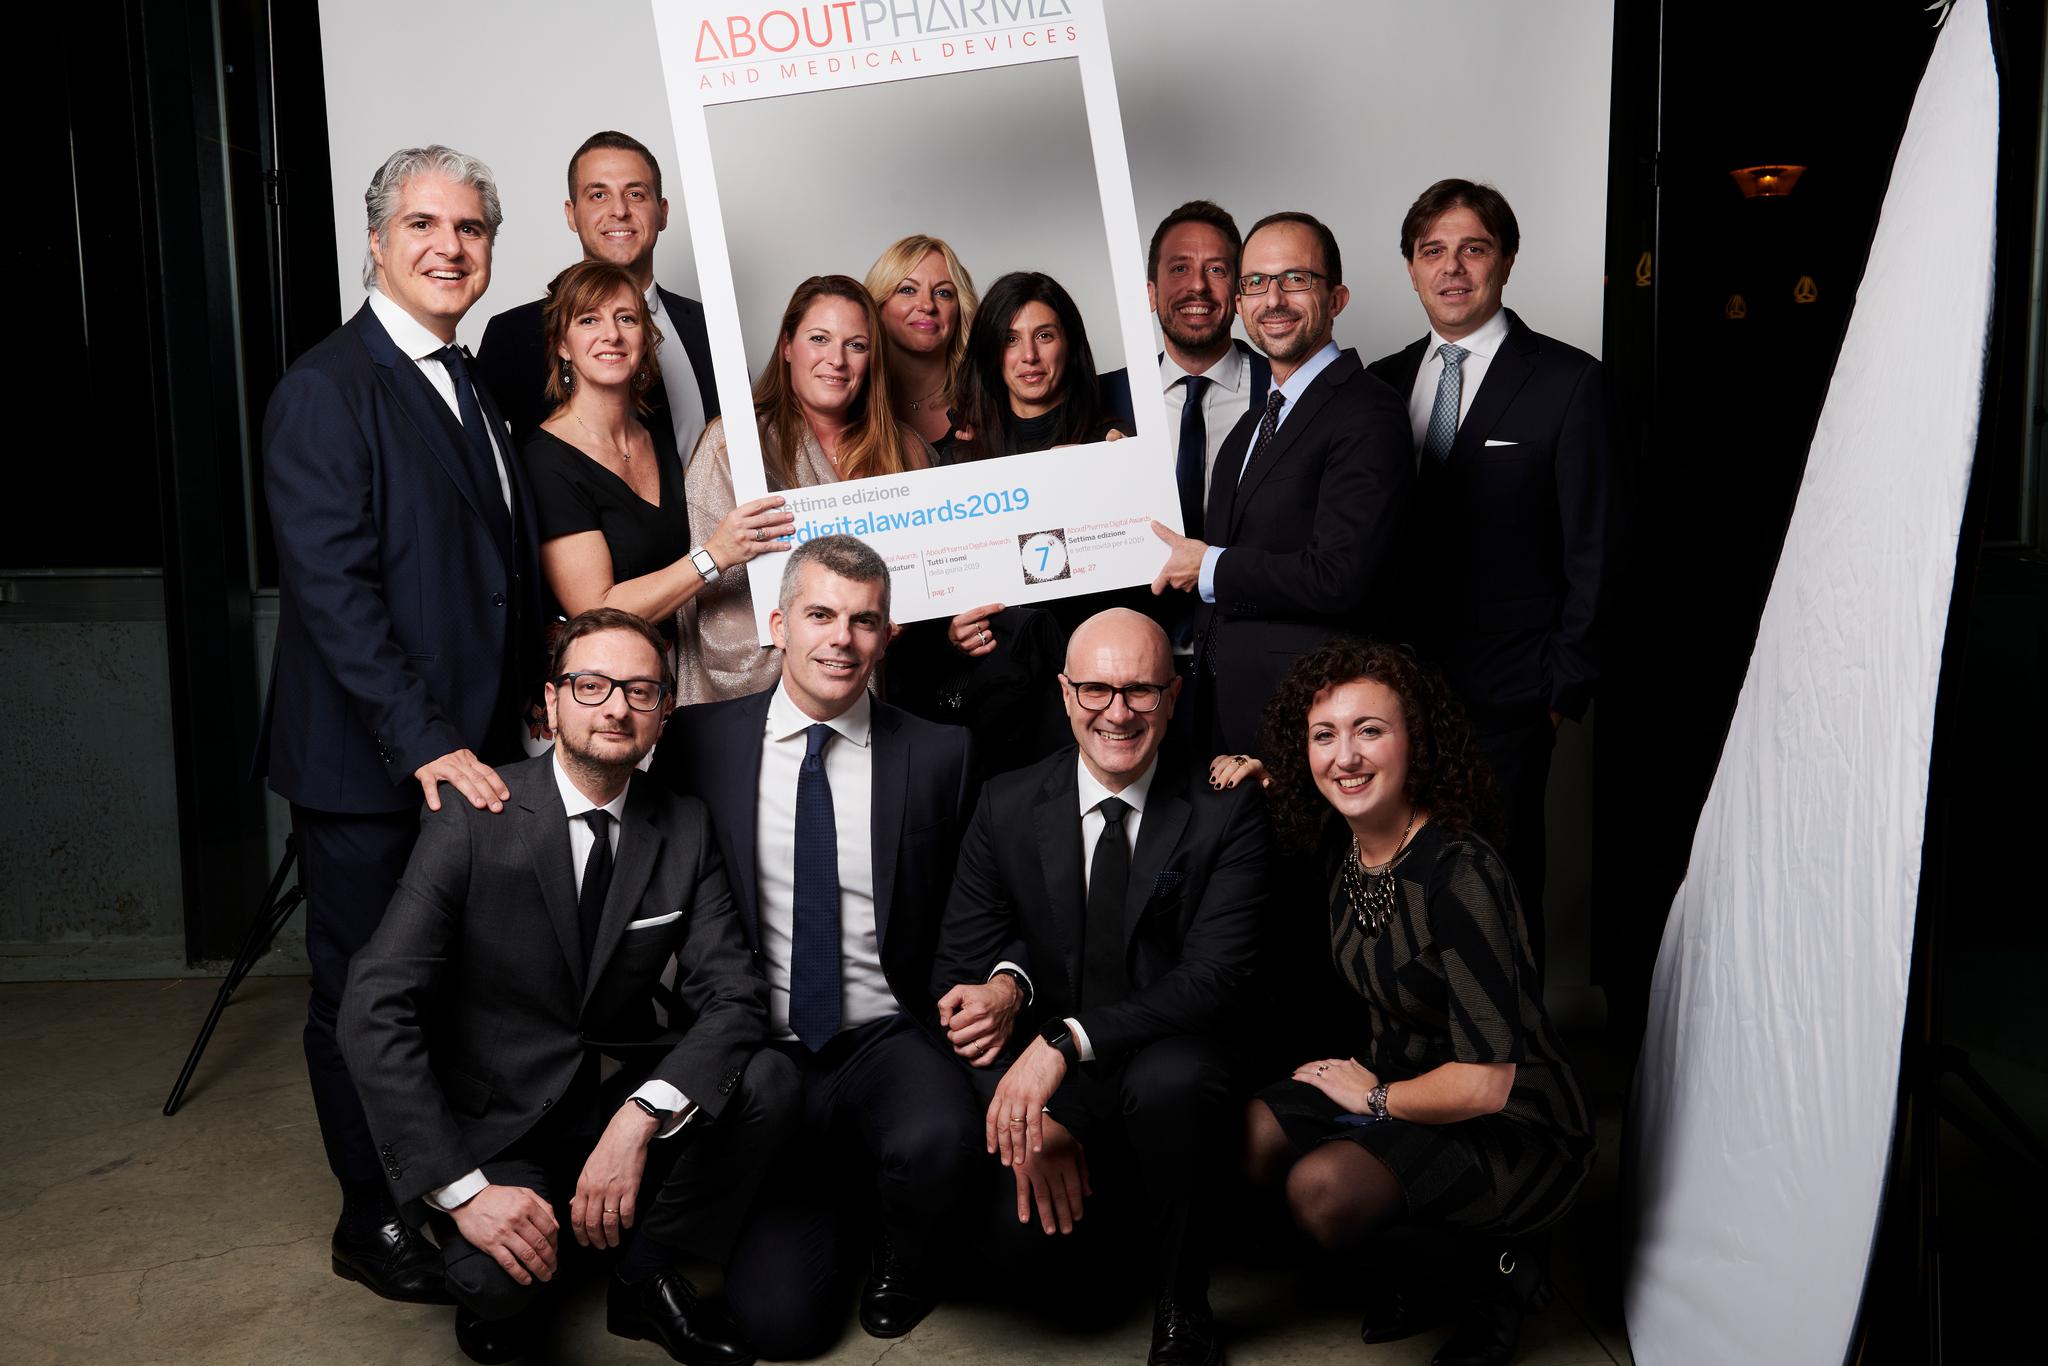 Photobooth AboutPharma Digital Awards 2019_45